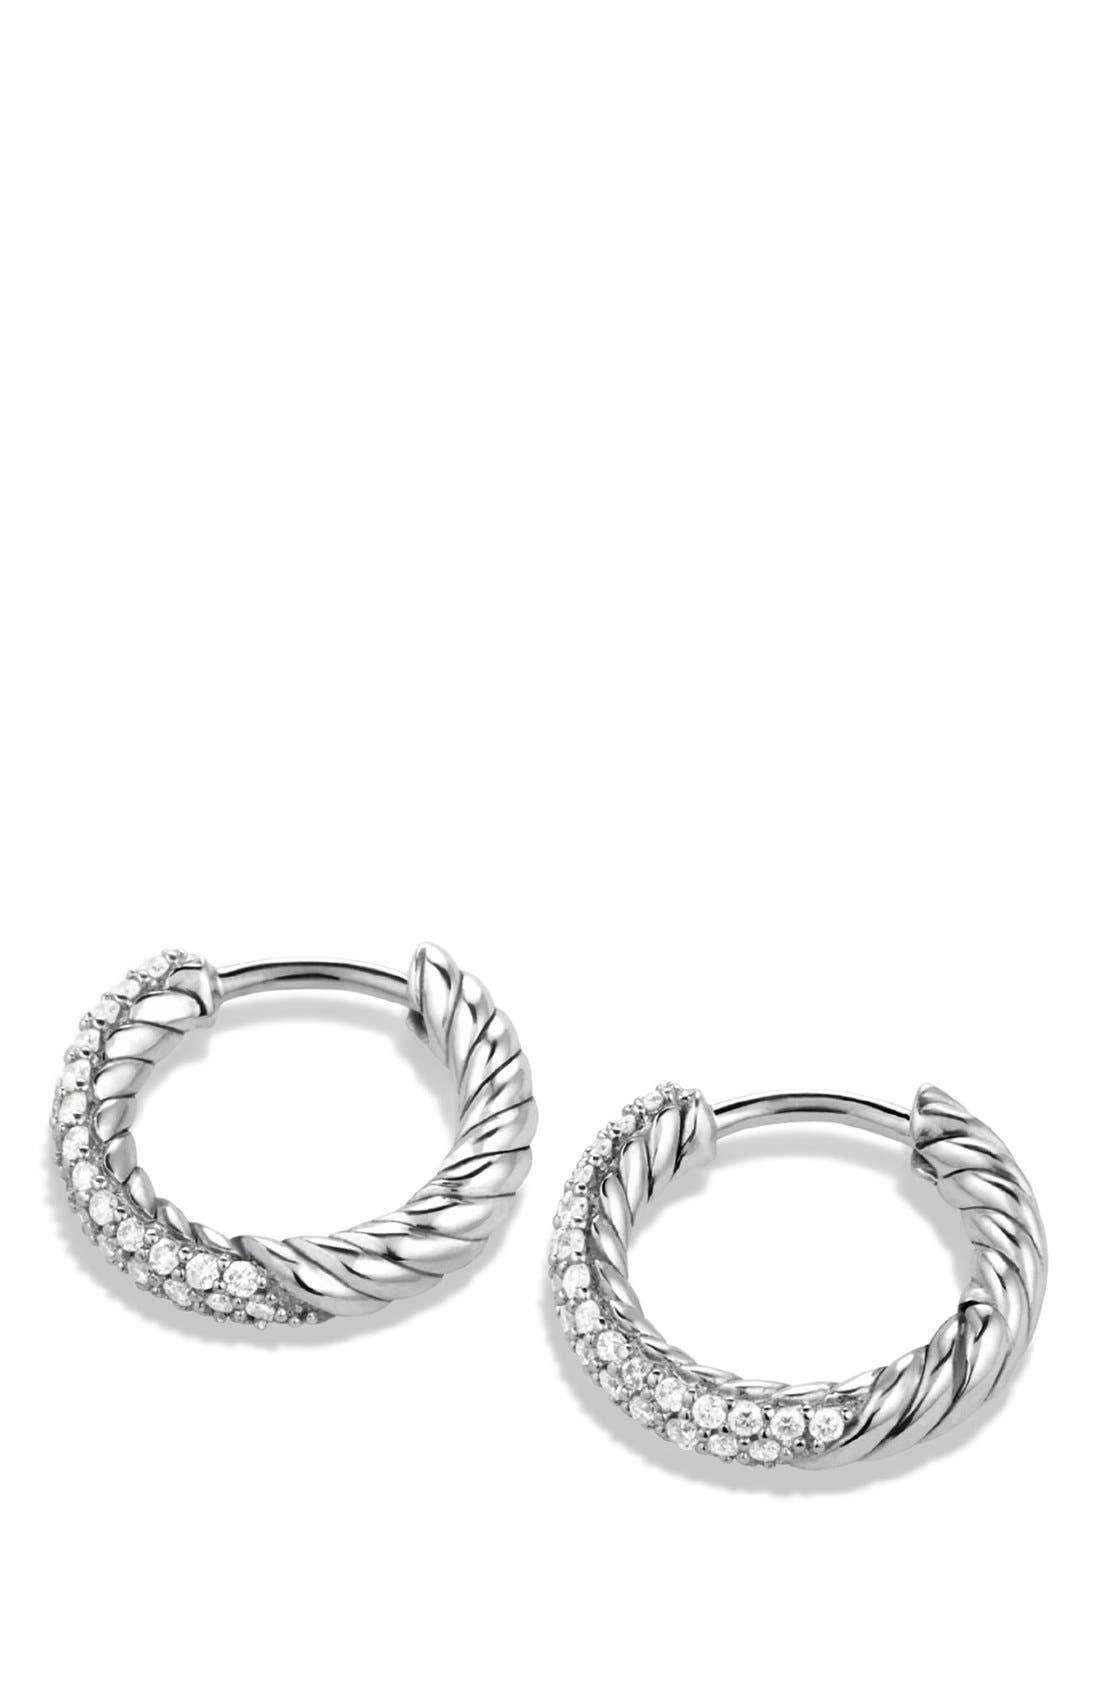 Petite Pavé Earrings with Diamonds,                             Alternate thumbnail 2, color,                             Diamond